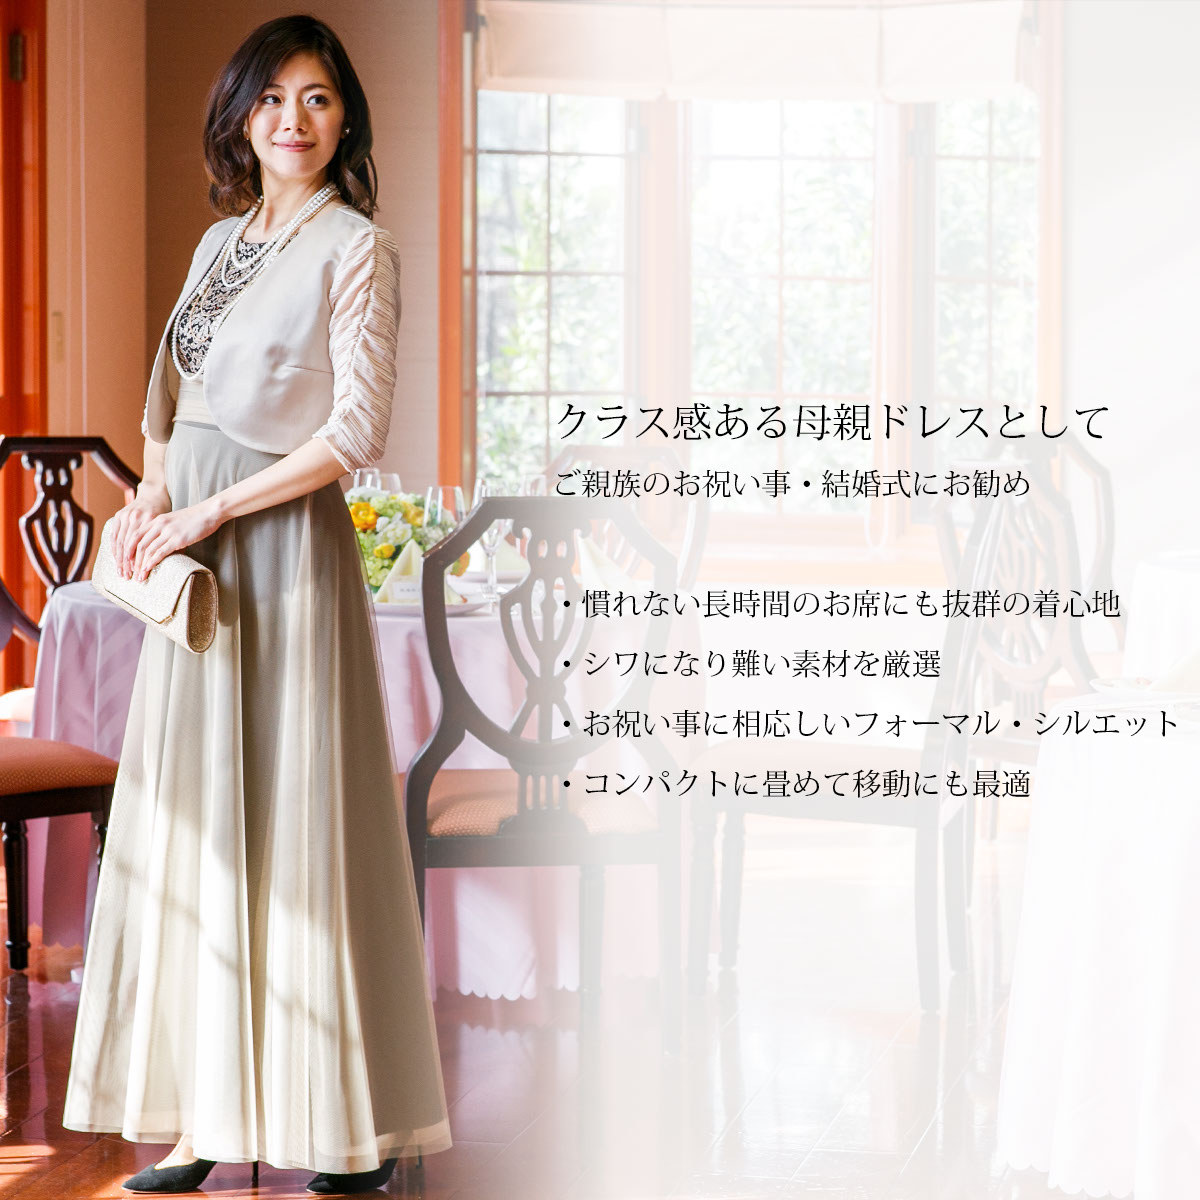 演奏会用ドレスFD-180086